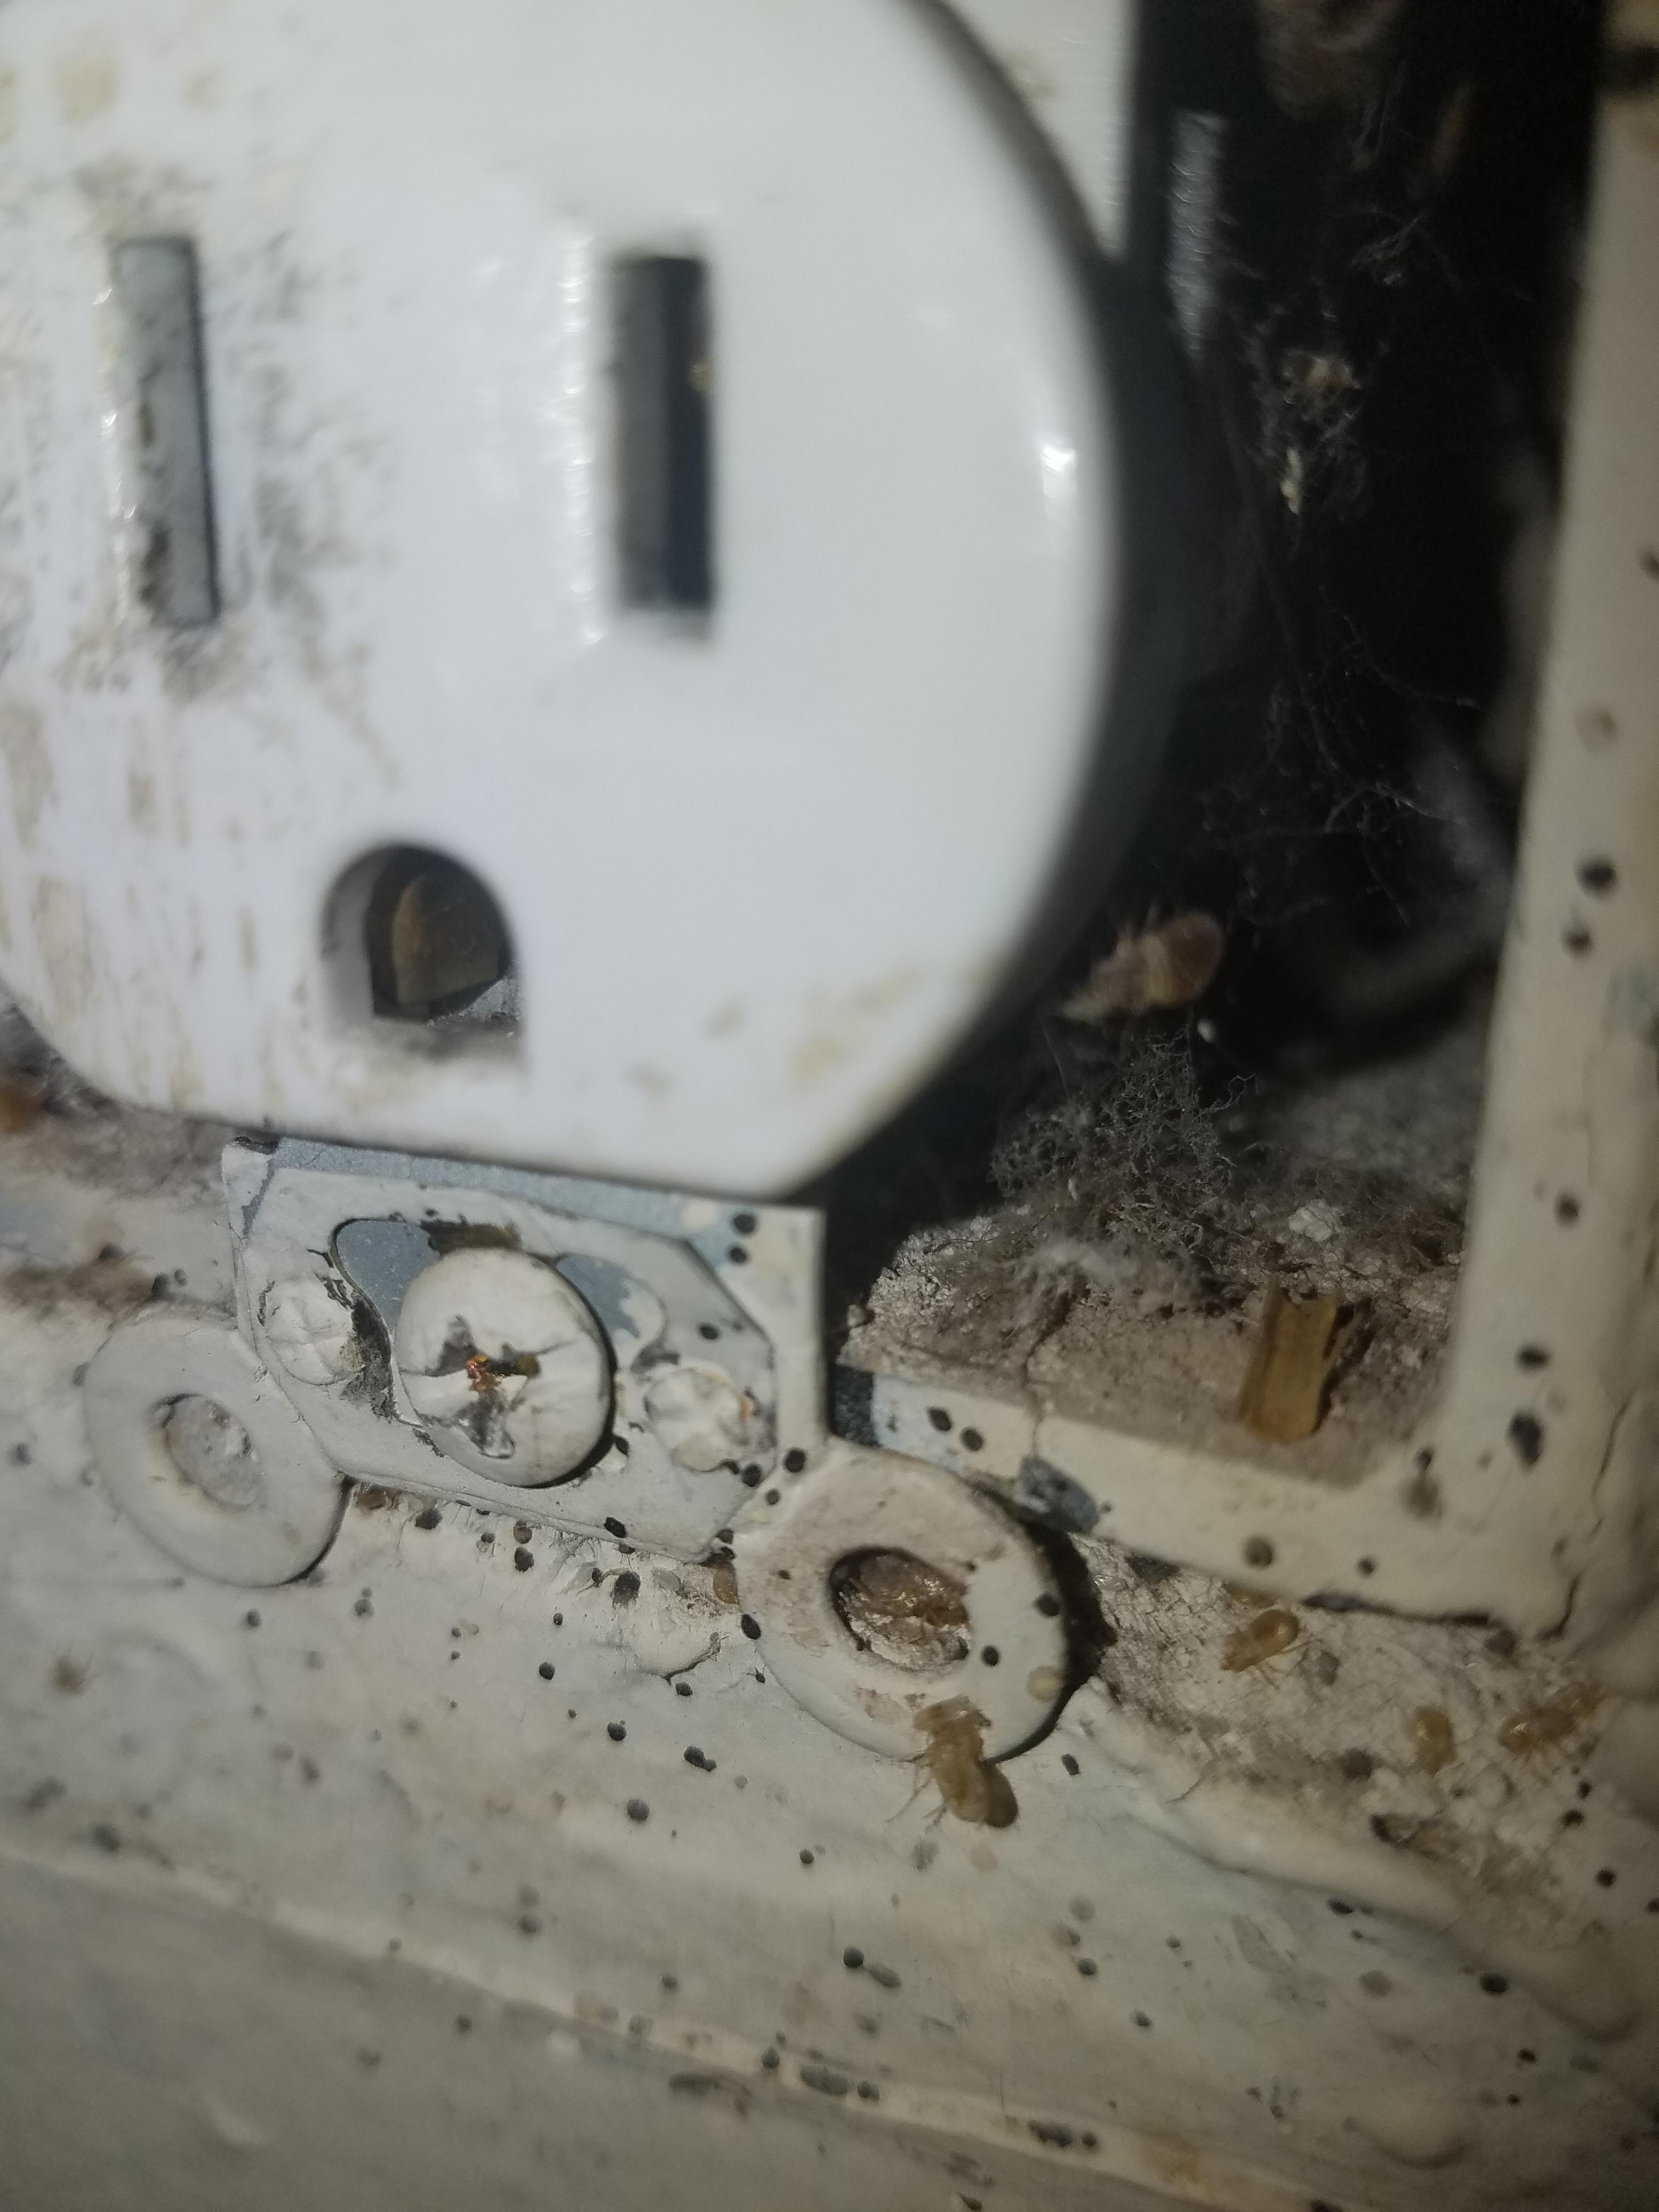 TLC Bed Bugs K-9 Inspection Service image 13